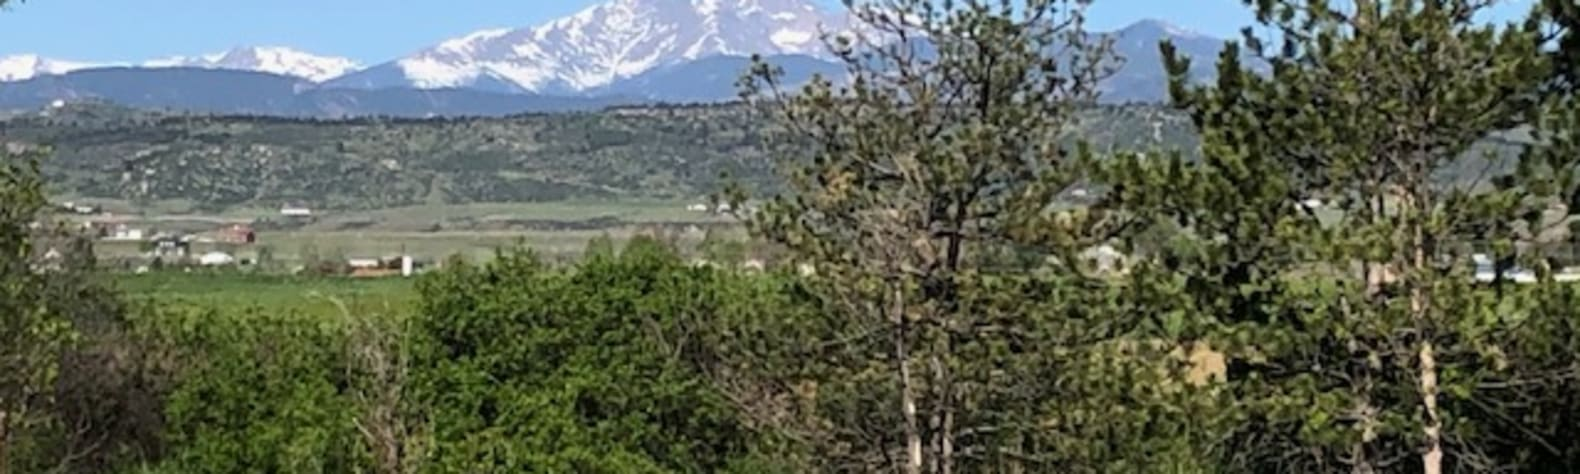 Colorado Farm with Views